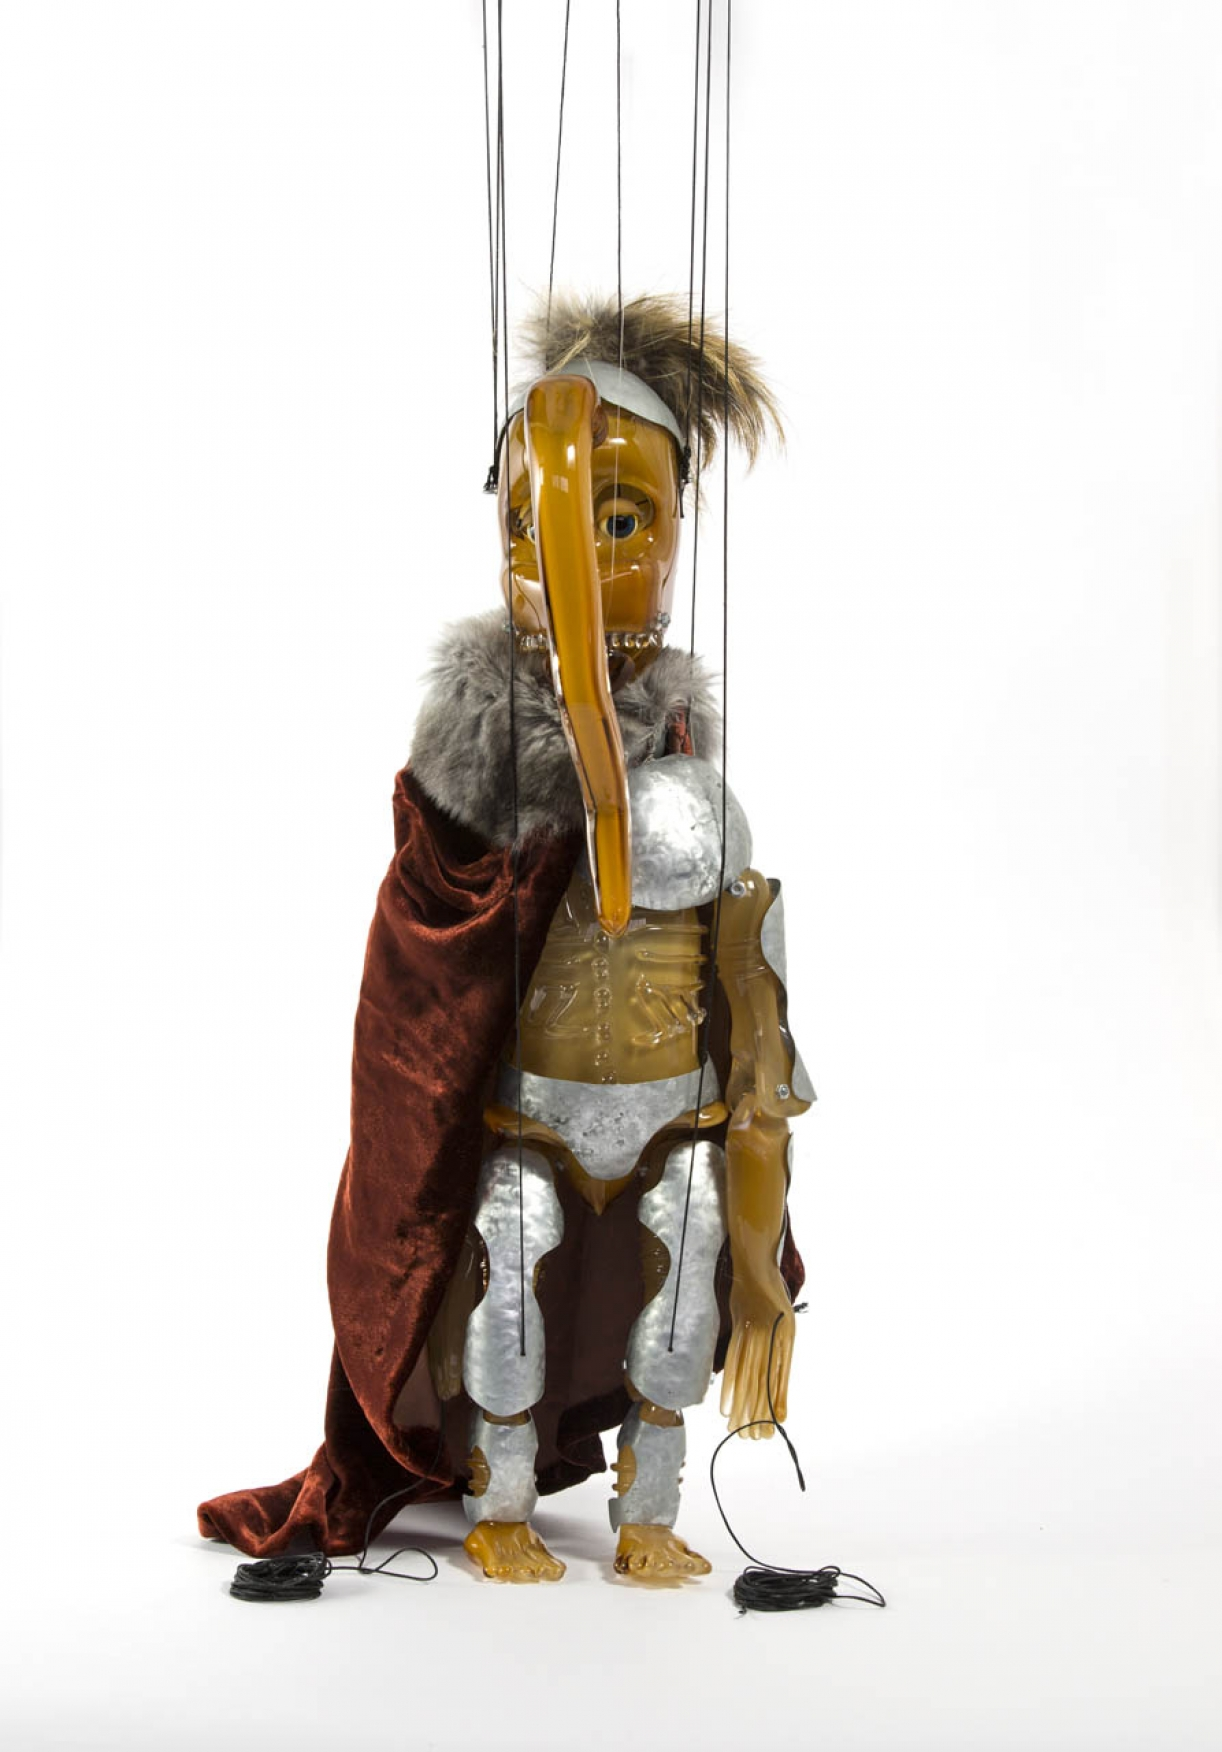 Cabaret Crusades: The Secrets of Karbalaa, Marionette (Orange soldier), Glass, fabric, enamel, thread, 51 x 16 x 13 cm